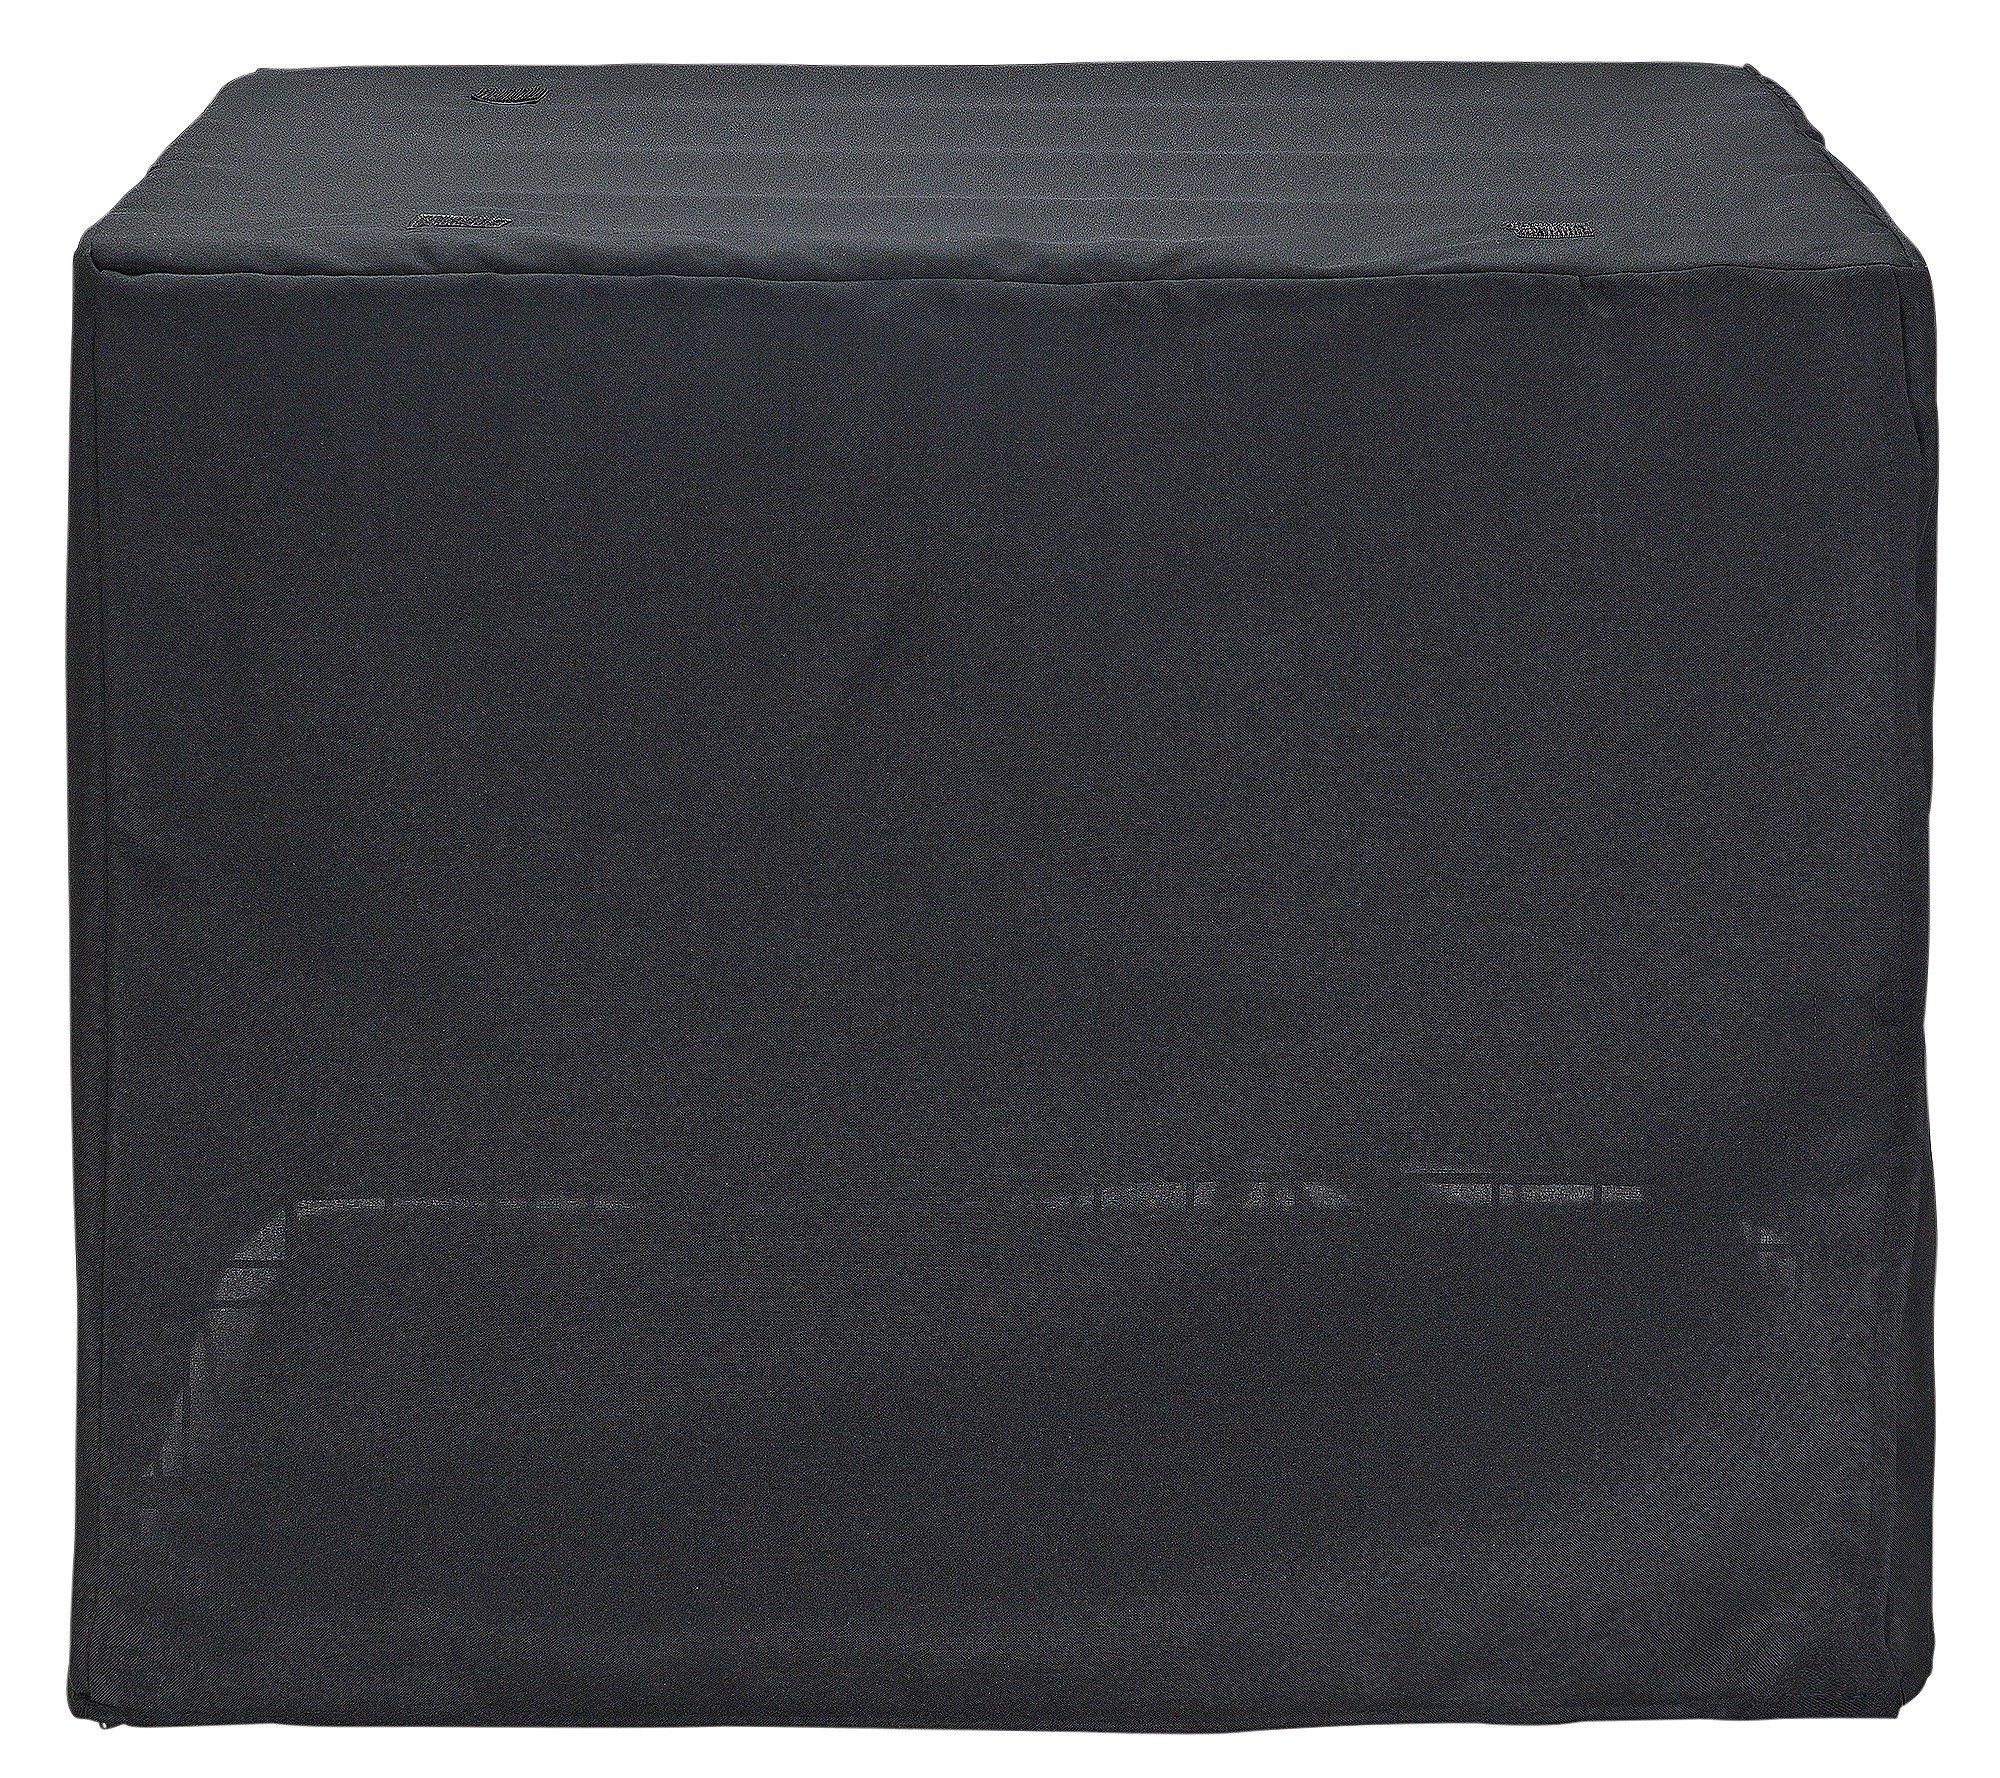 king-pet-crate-cover-medium